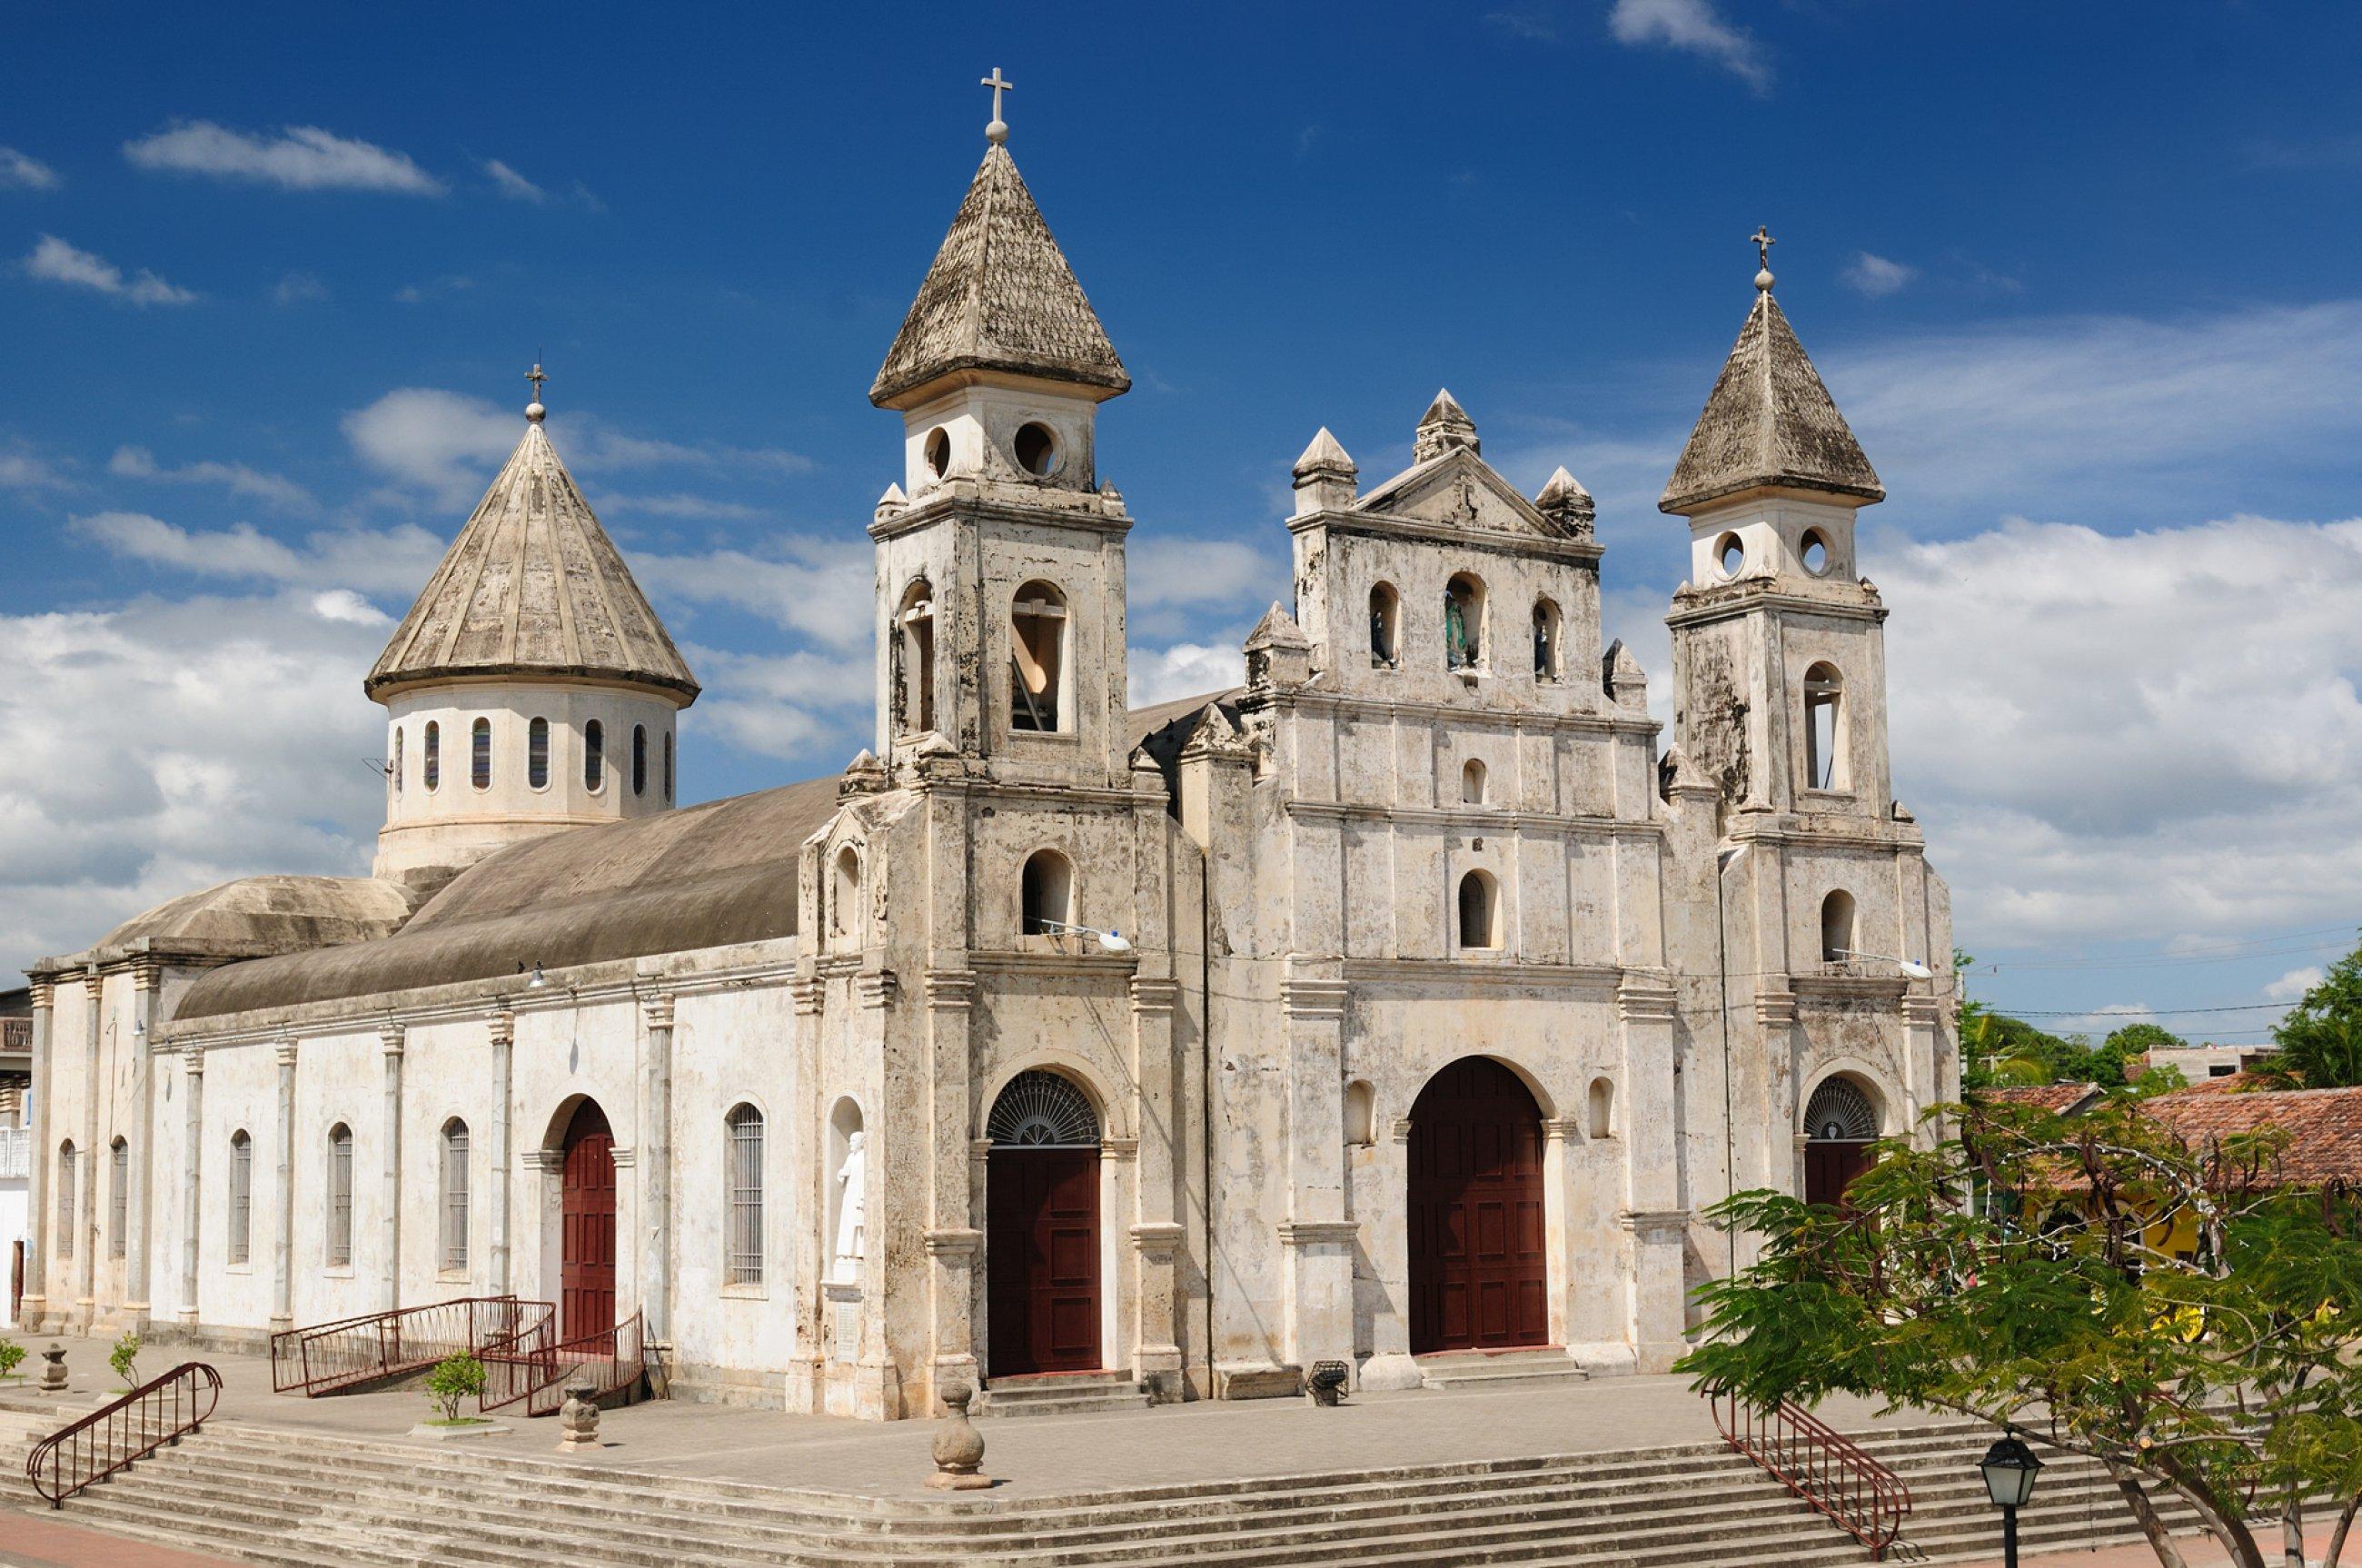 https://bubo.sk/uploads/galleries/7338/nikaragua-granada-the-colonial-oldest-spanish-city-in-nicaragua.jpg